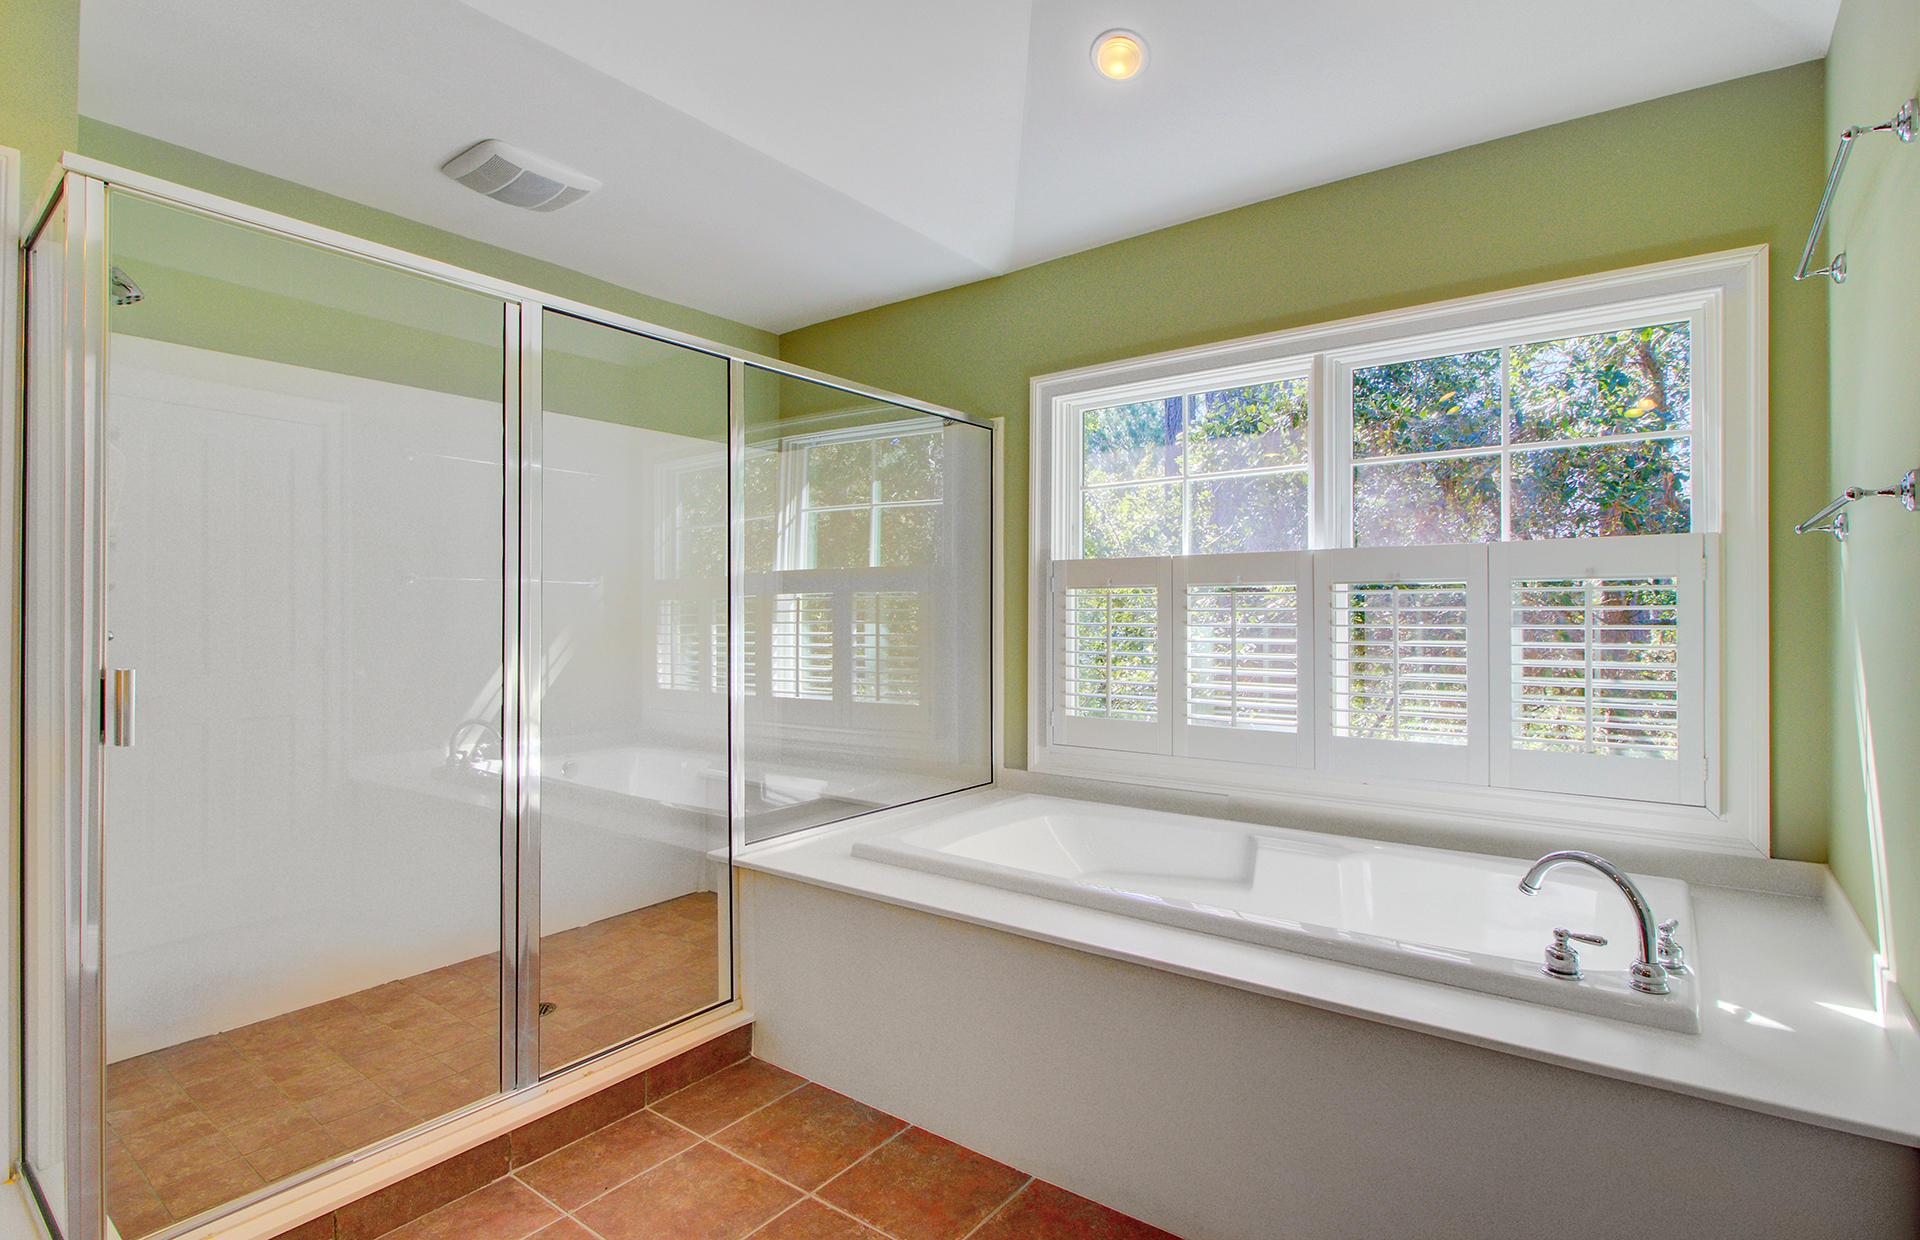 Kiawah Island Homes For Sale - 402 Ocean Oaks, Kiawah Island, SC - 25